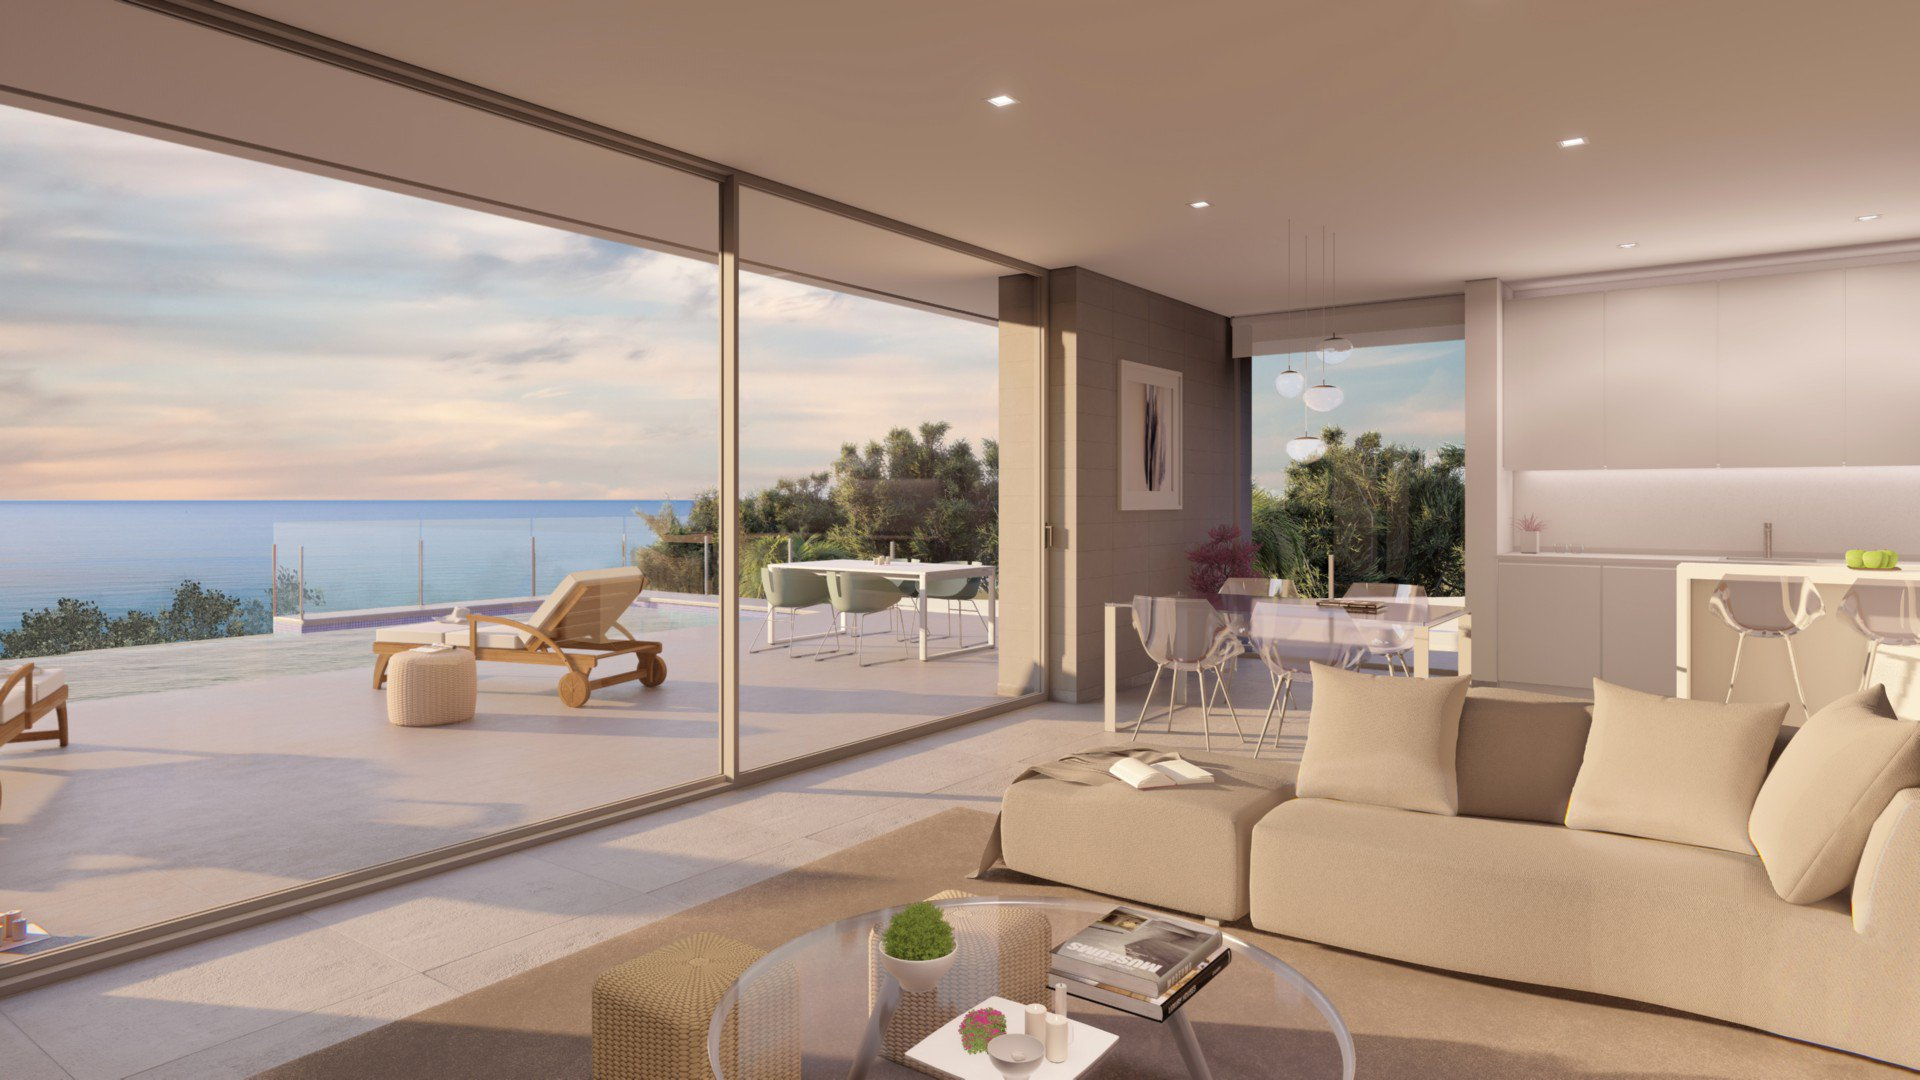 Villa design moderne située à Benitachell